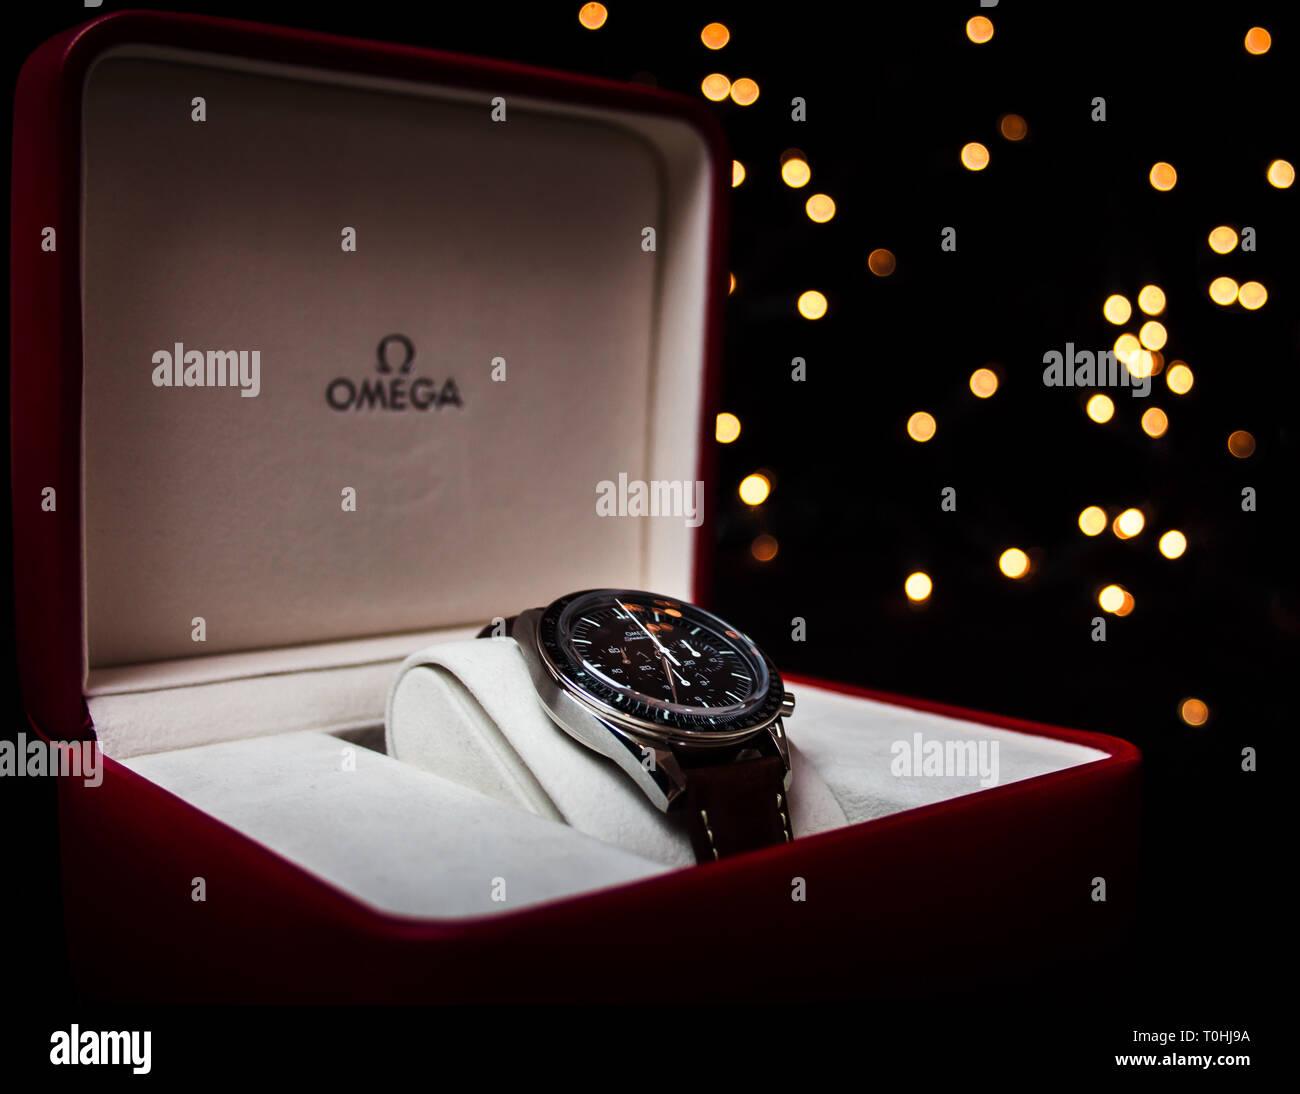 Omega Watch Wallpaper Stock Photos Omega Watch Wallpaper